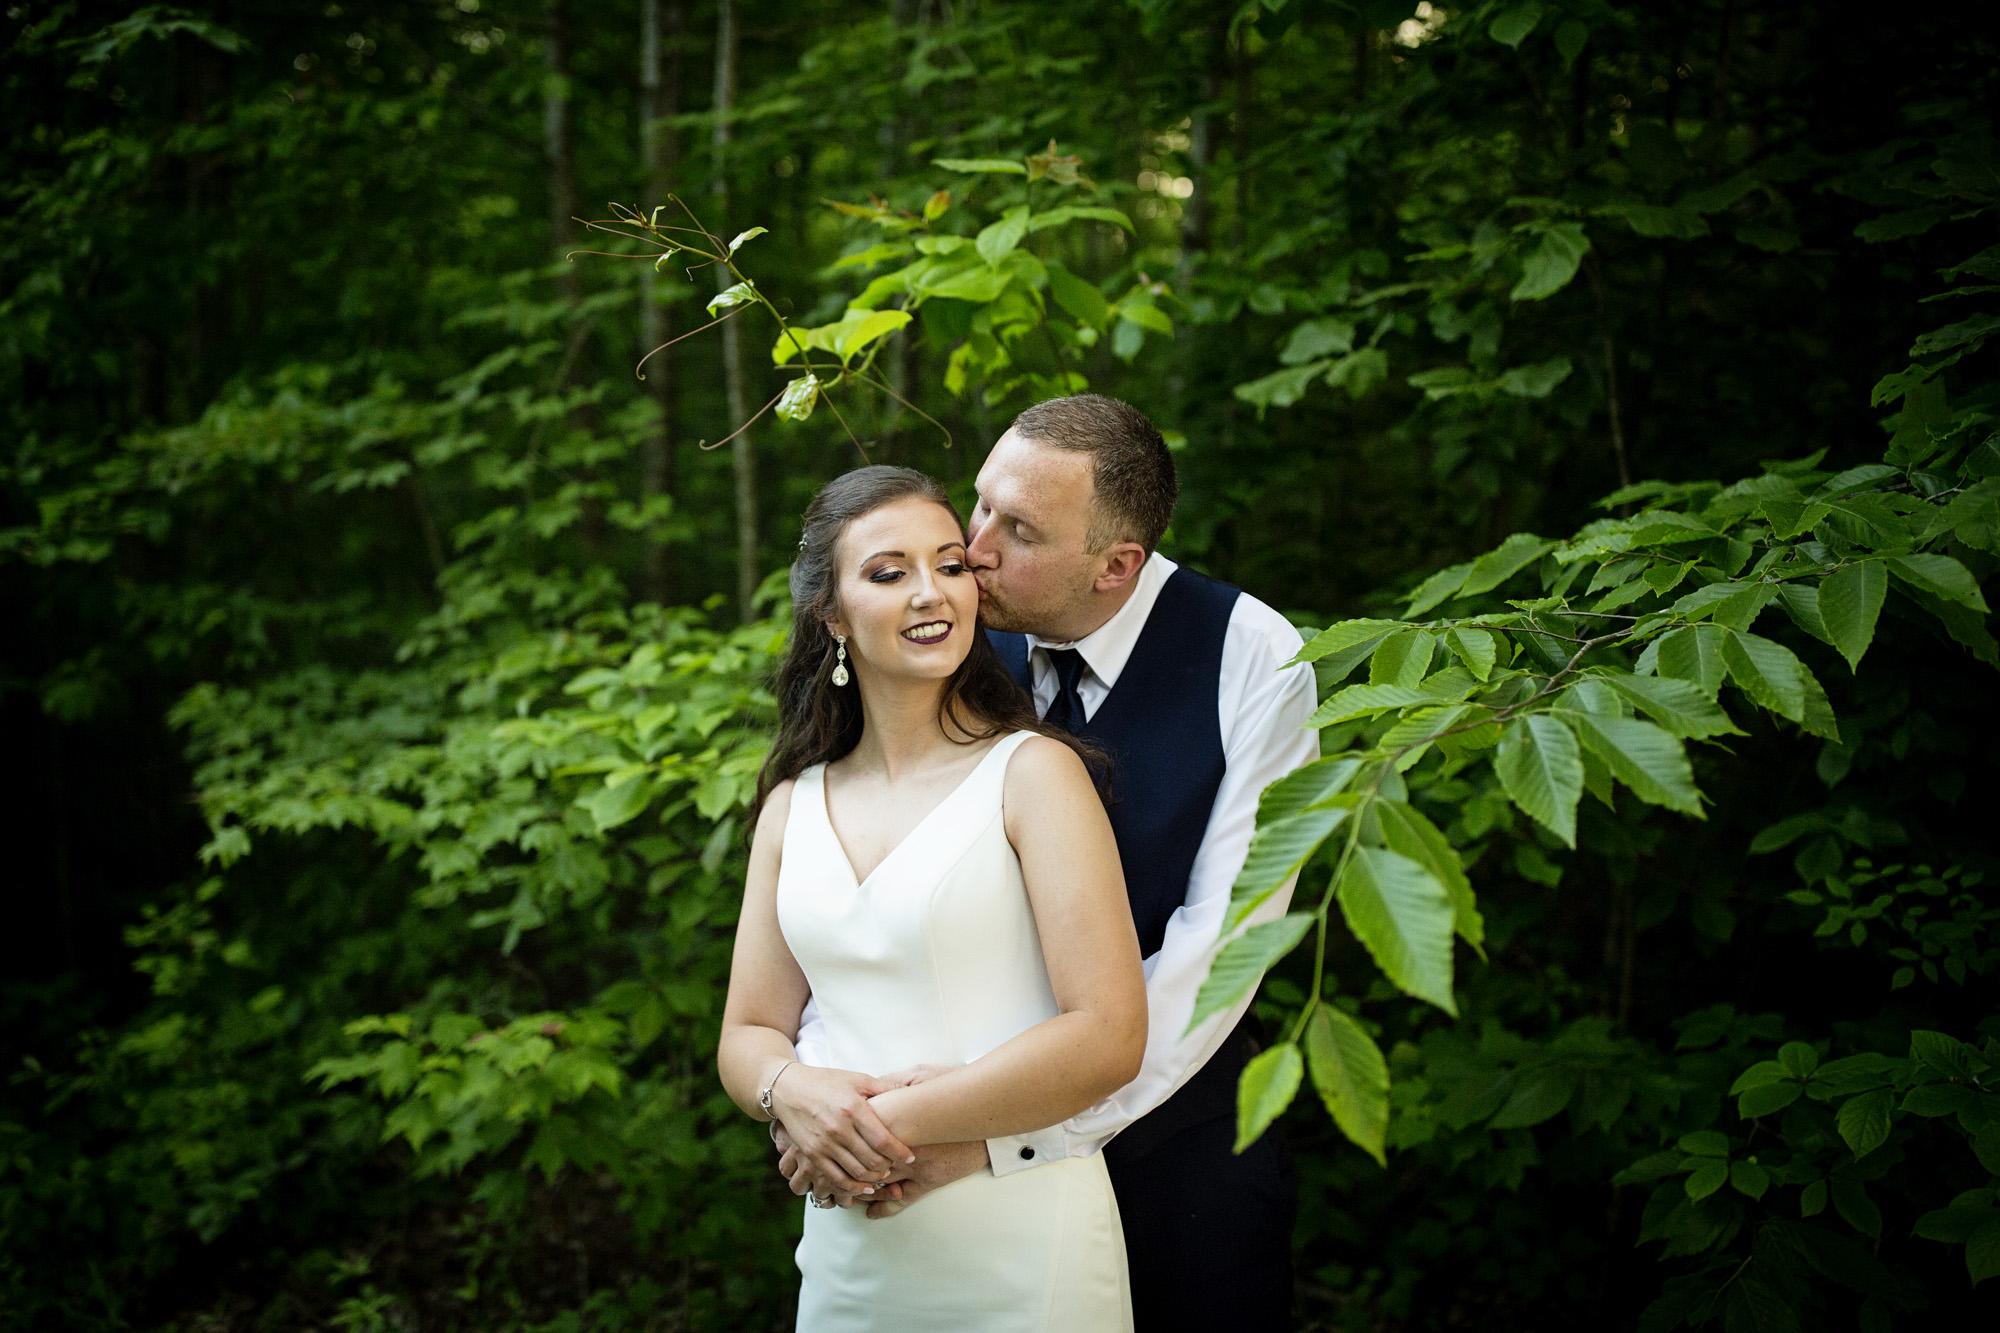 Seriously_Sabrina_Photography_Red_River_Gorge_Wedding_Barn_Robinson123.jpg